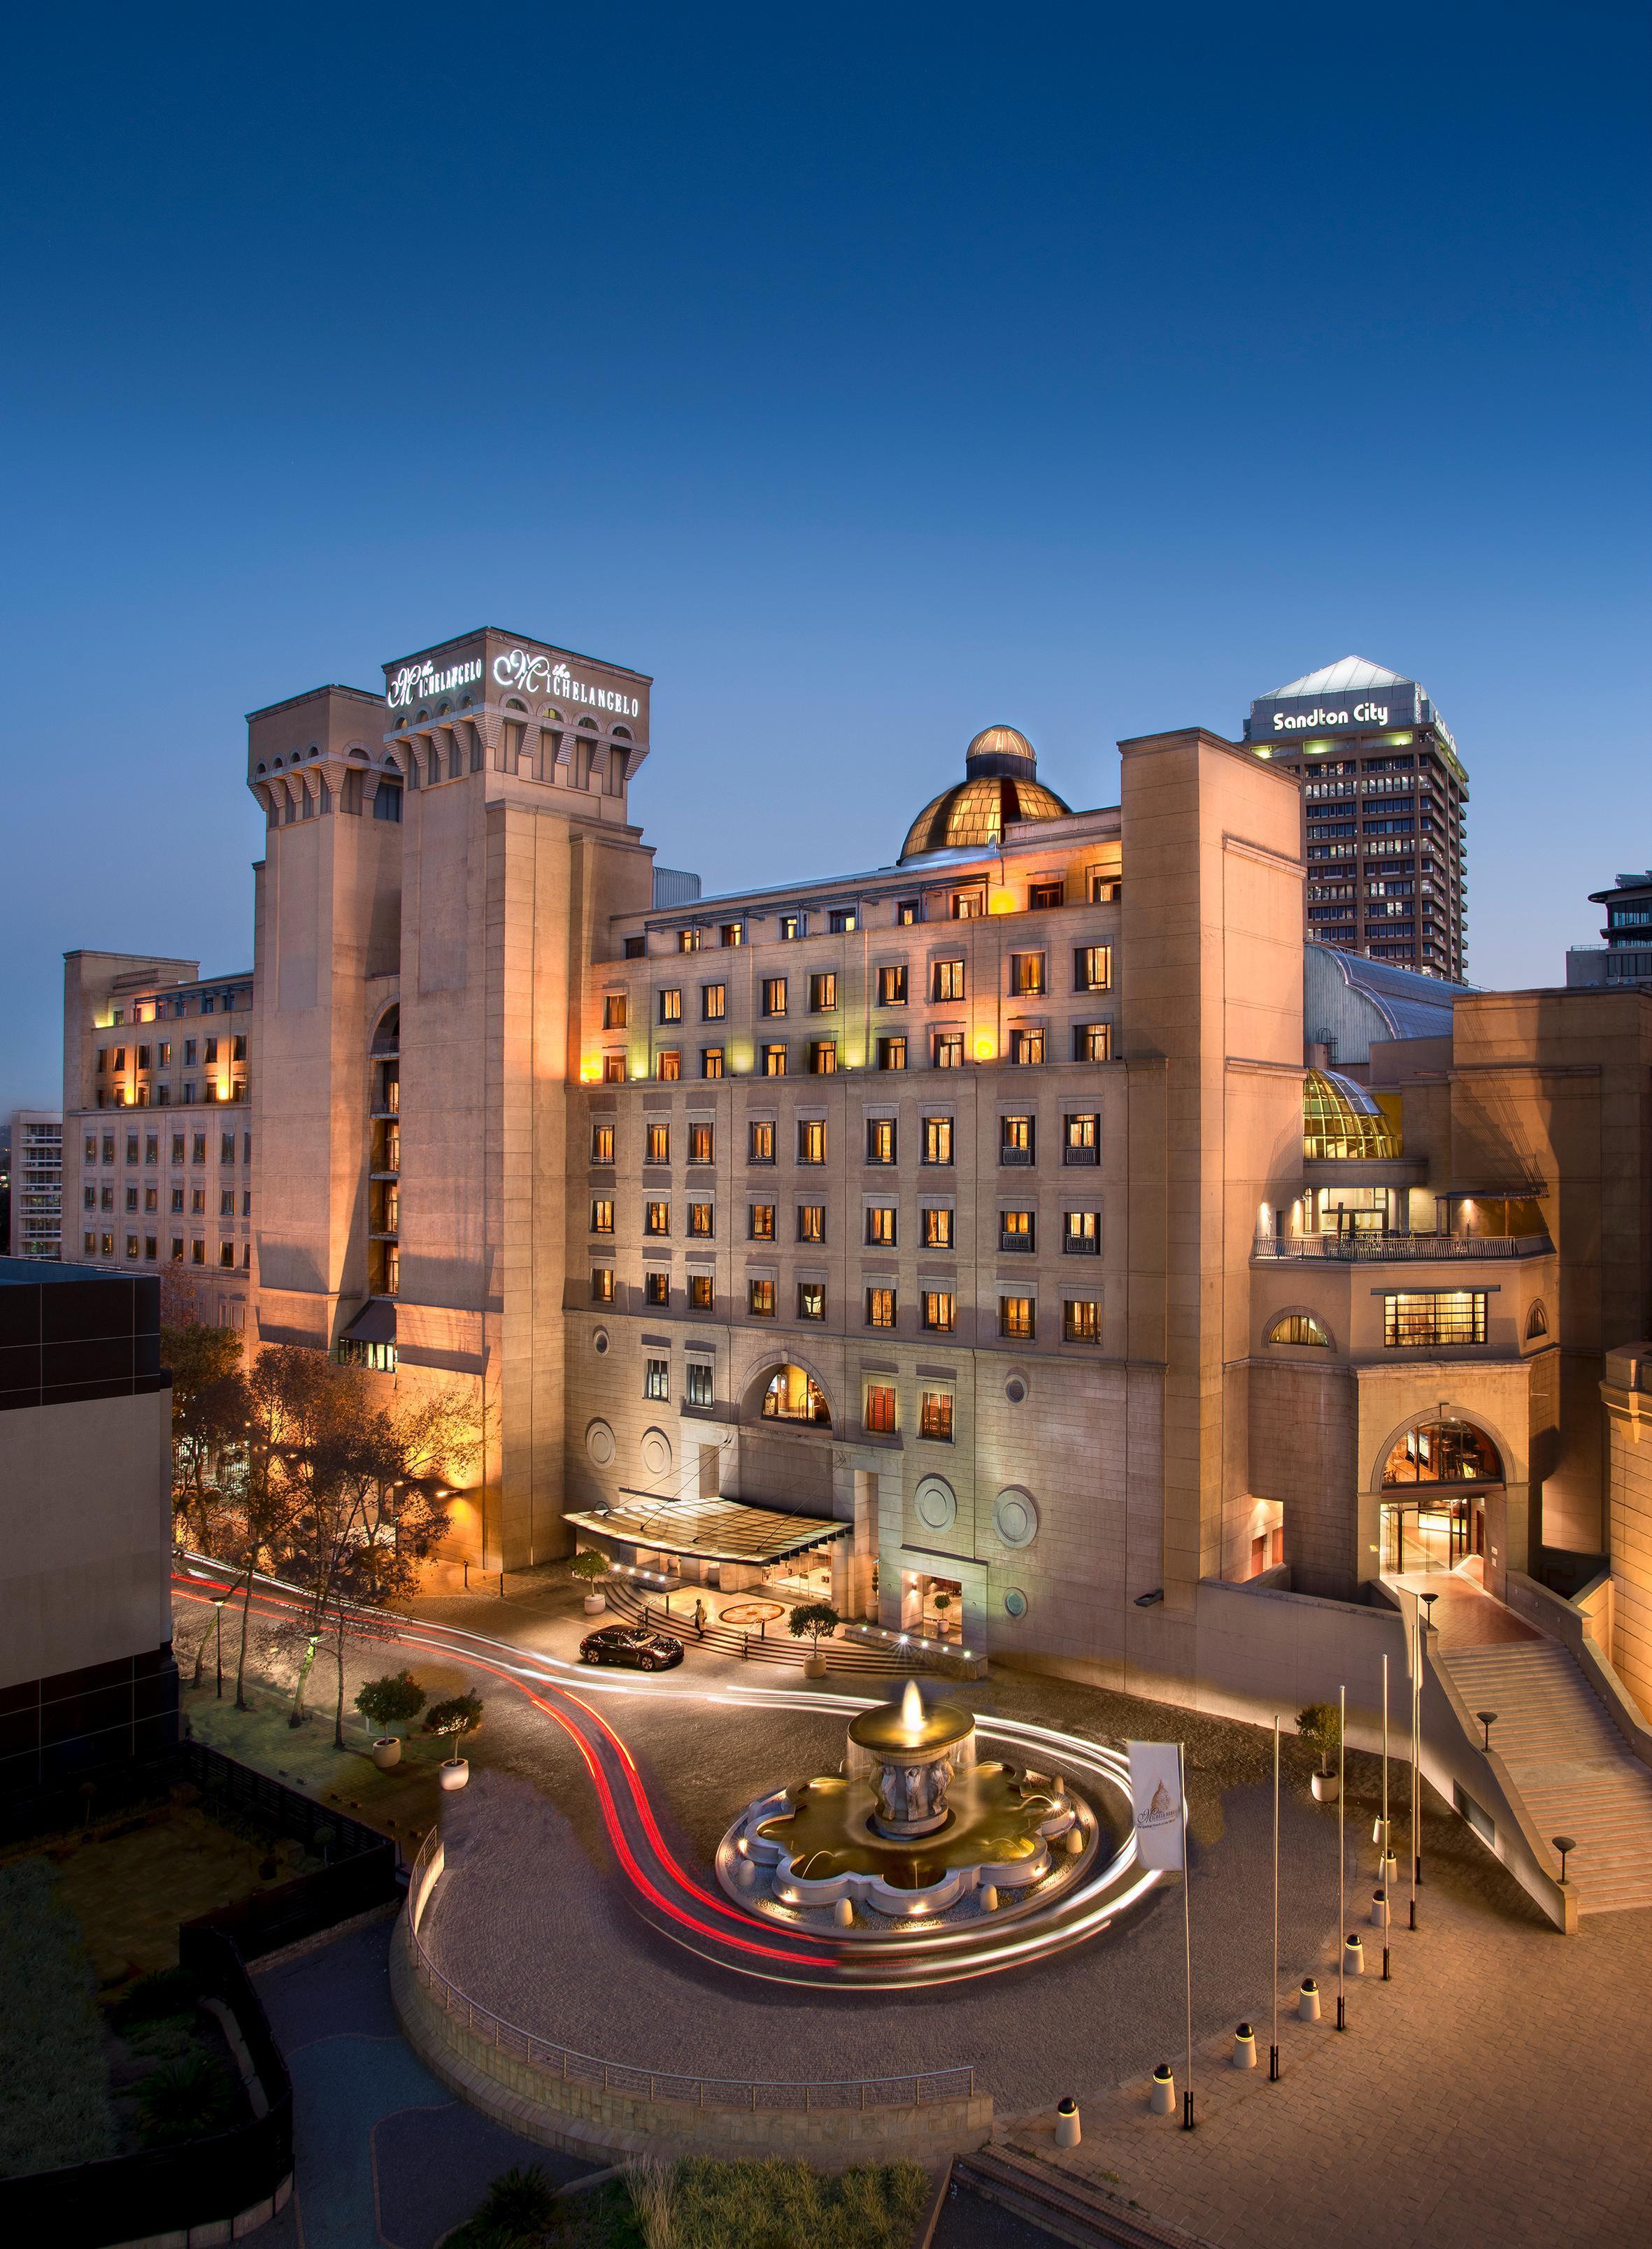 The Michelangelo Hotel, City of Johannesburg